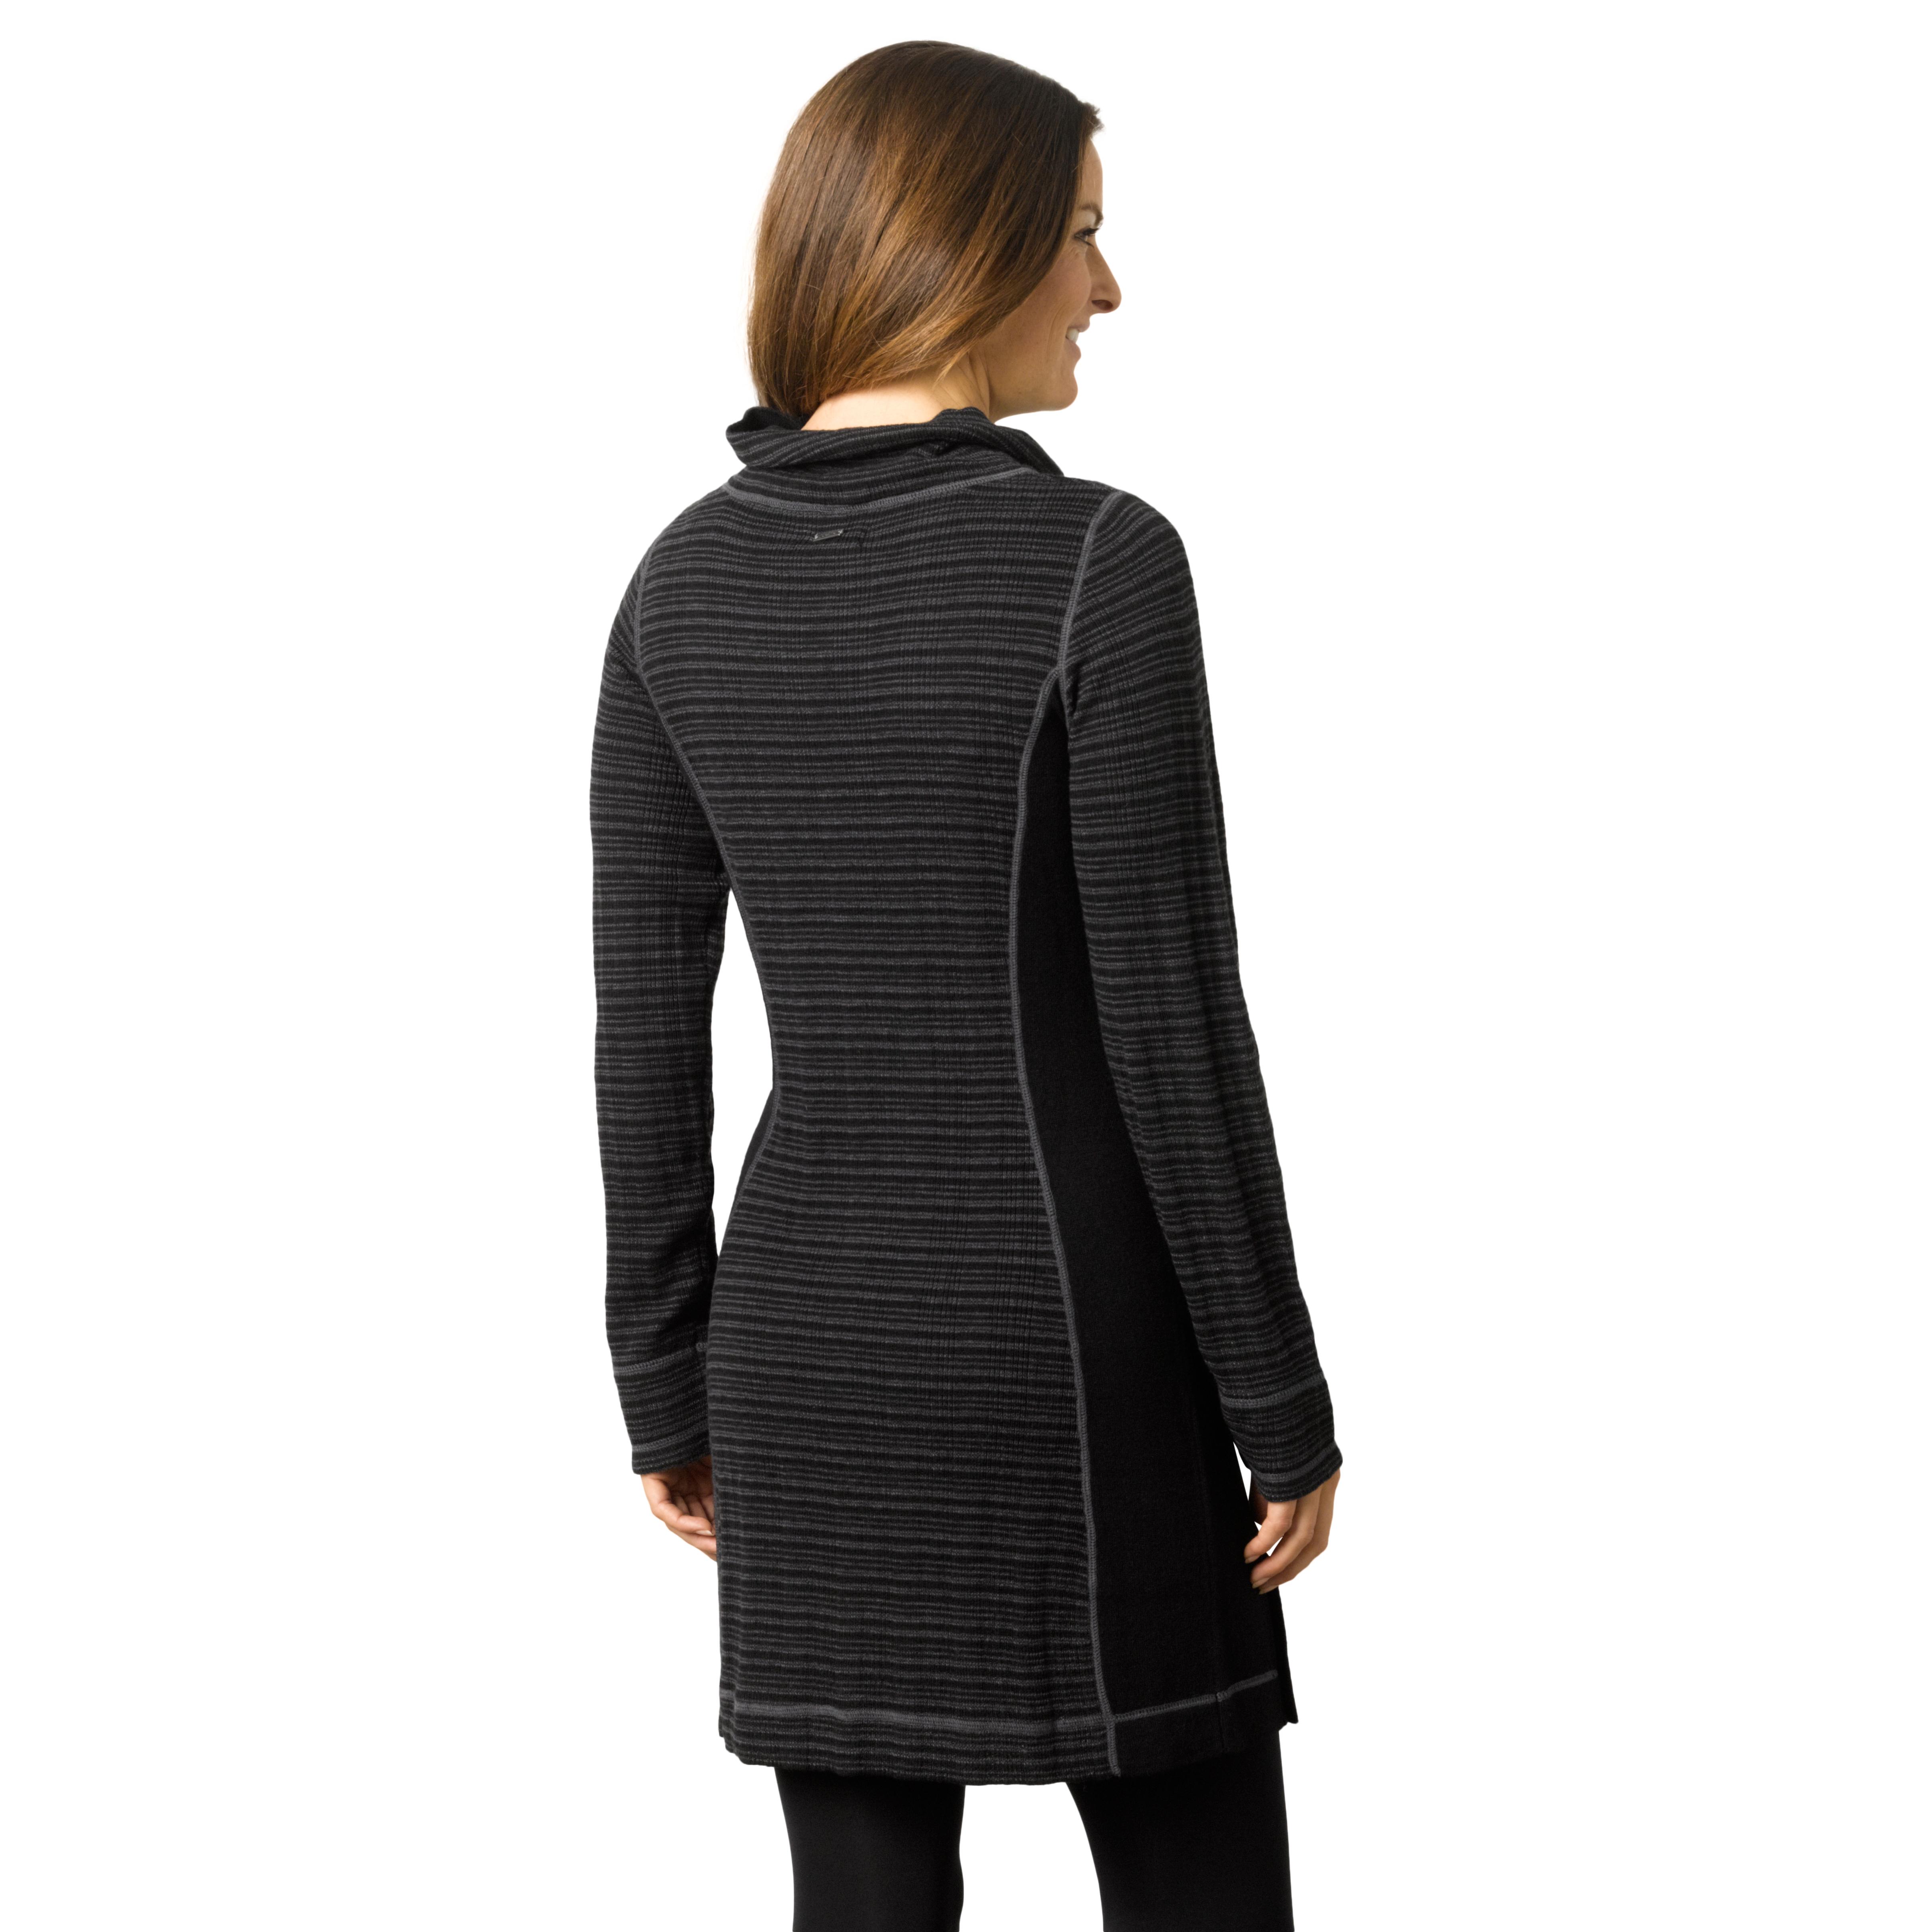 Prana women 39 s kelland dress coal m ebay for Prana women s shirts